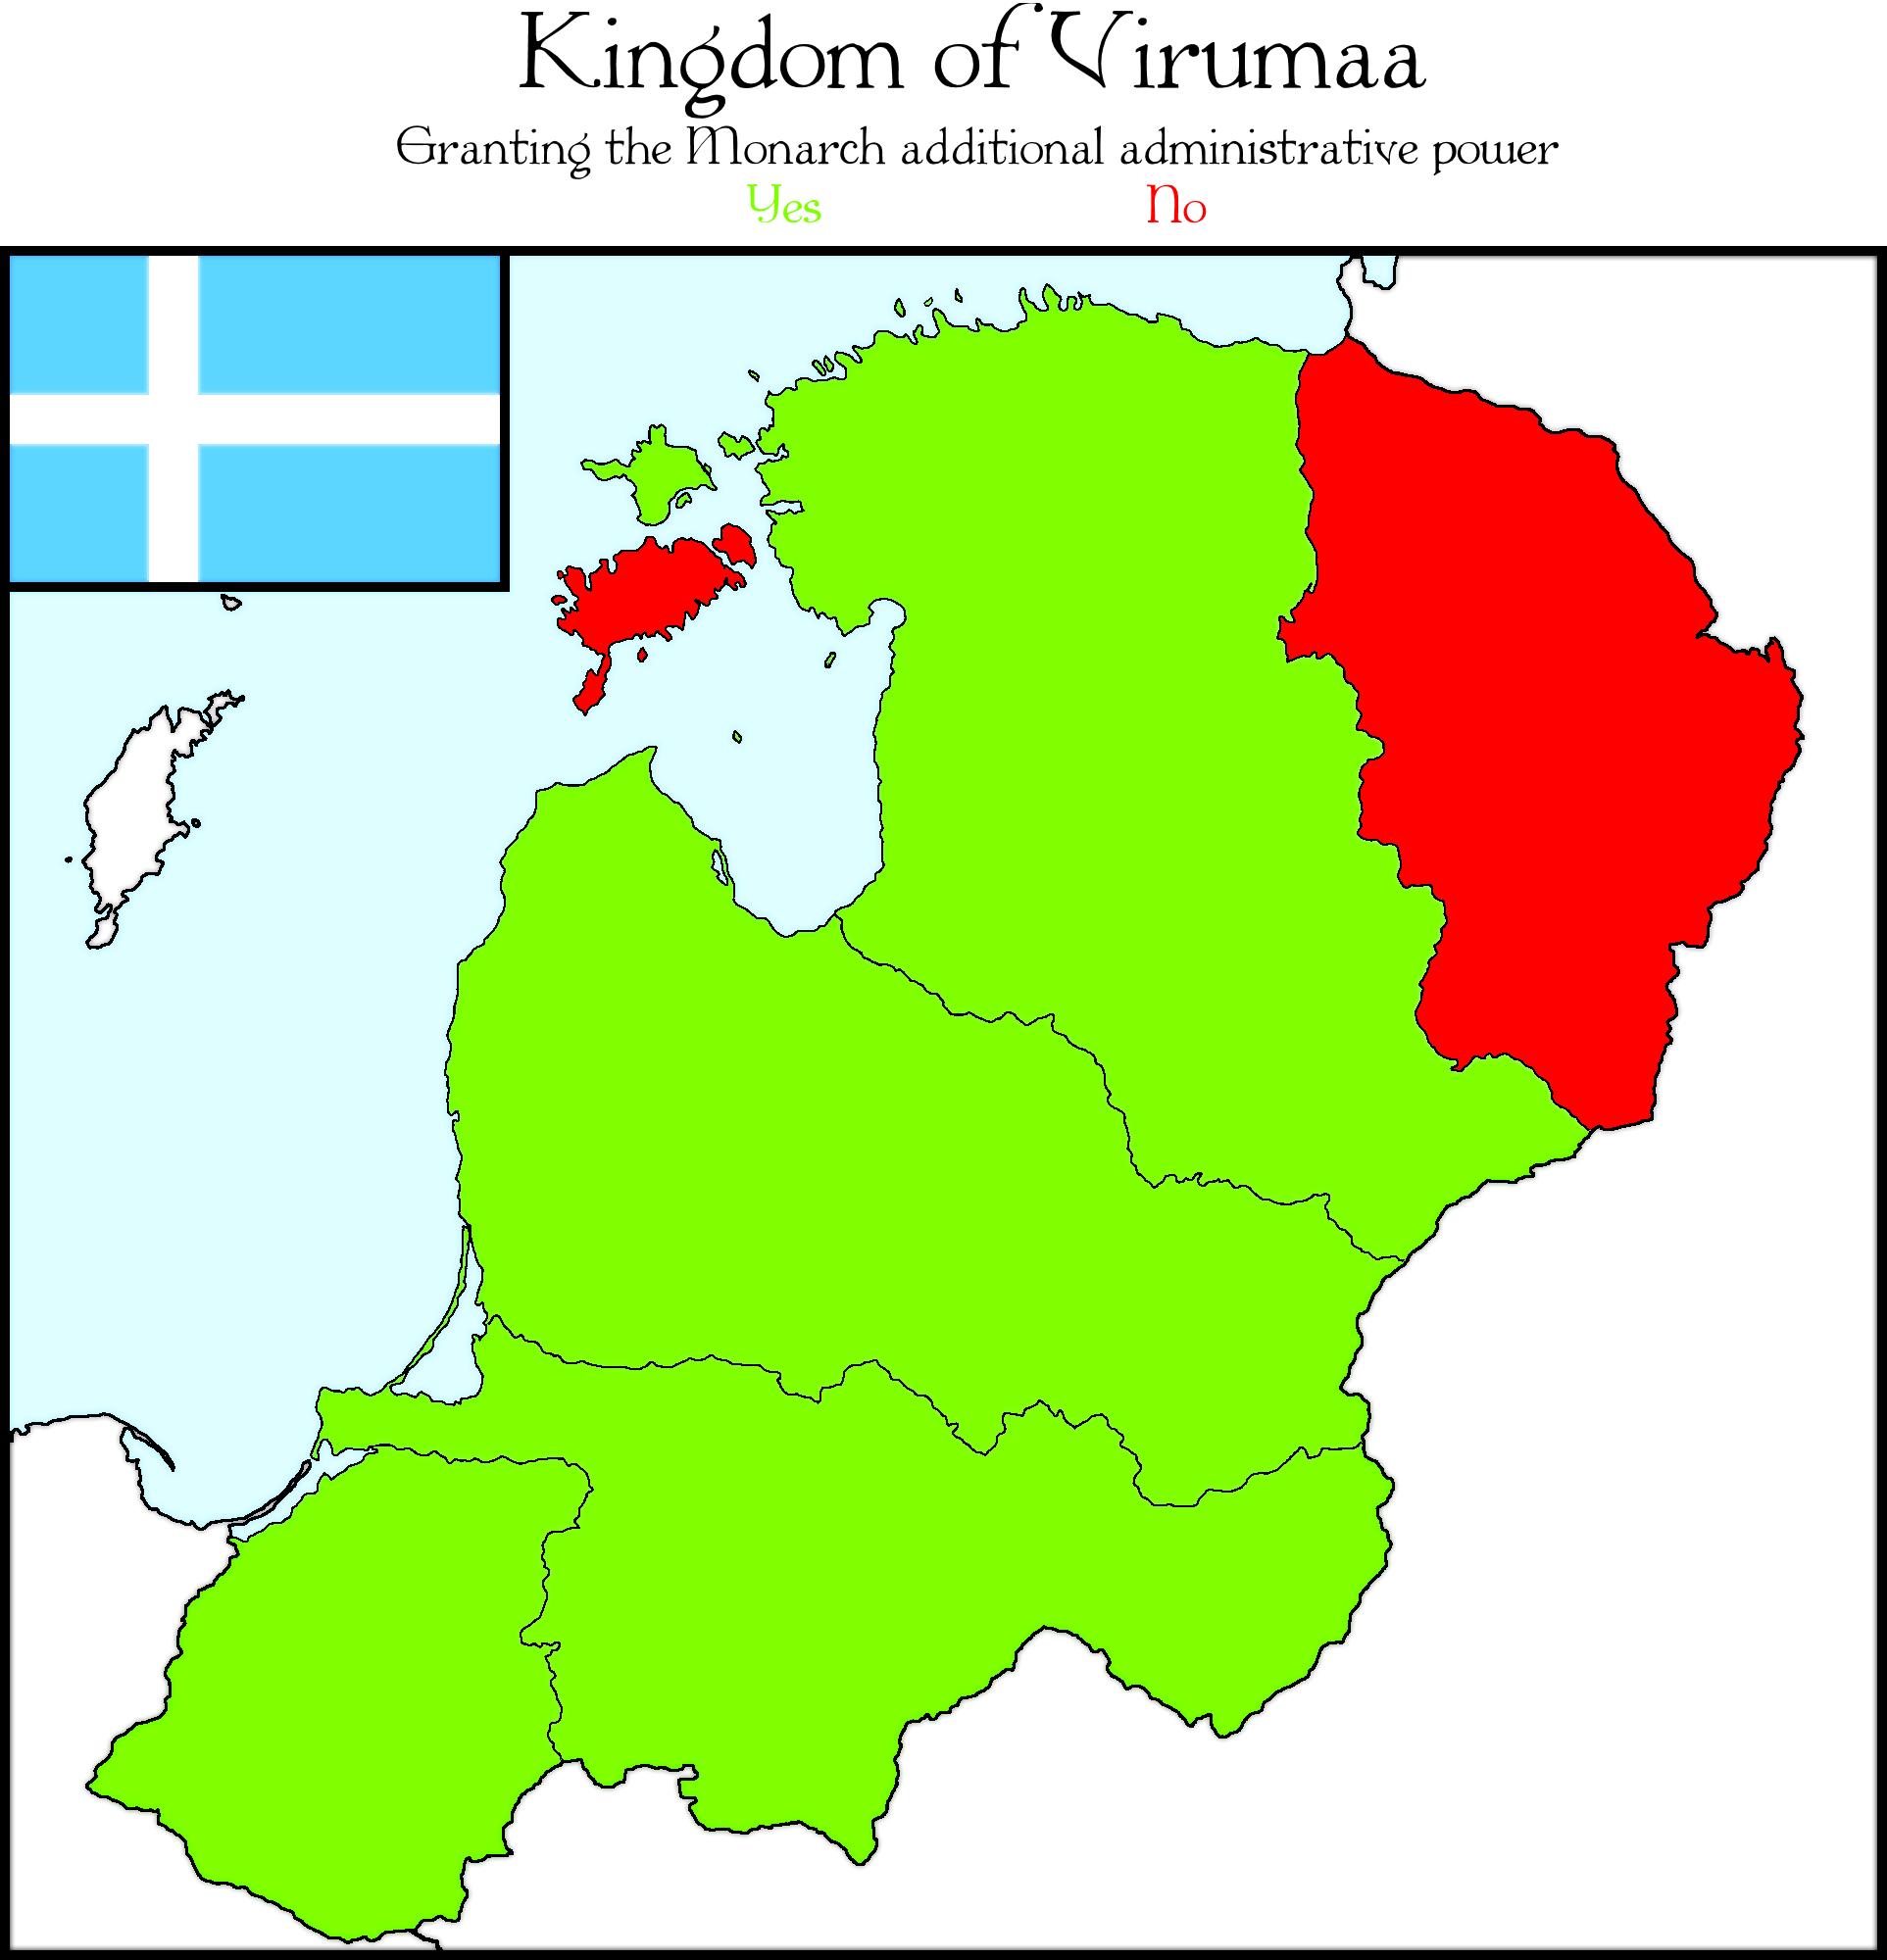 viruma results.png